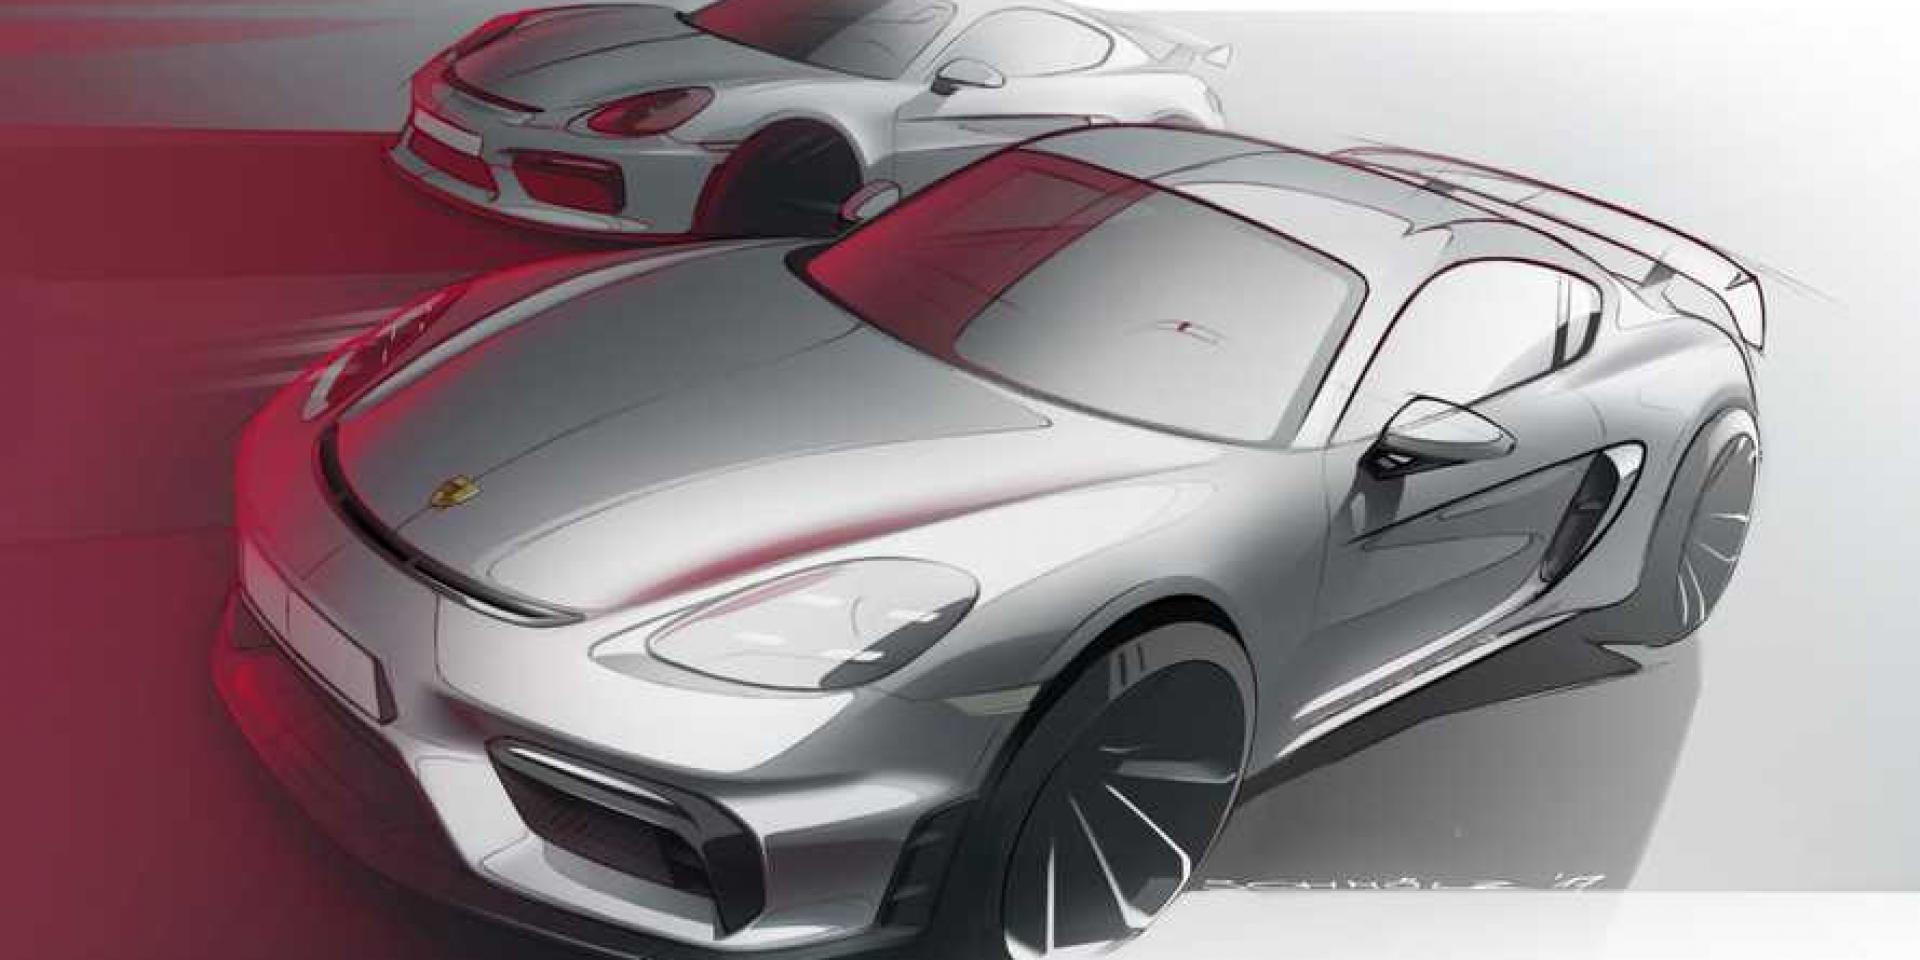 Porsche入門電動車 Cayman Electric將擁有400hp動力!